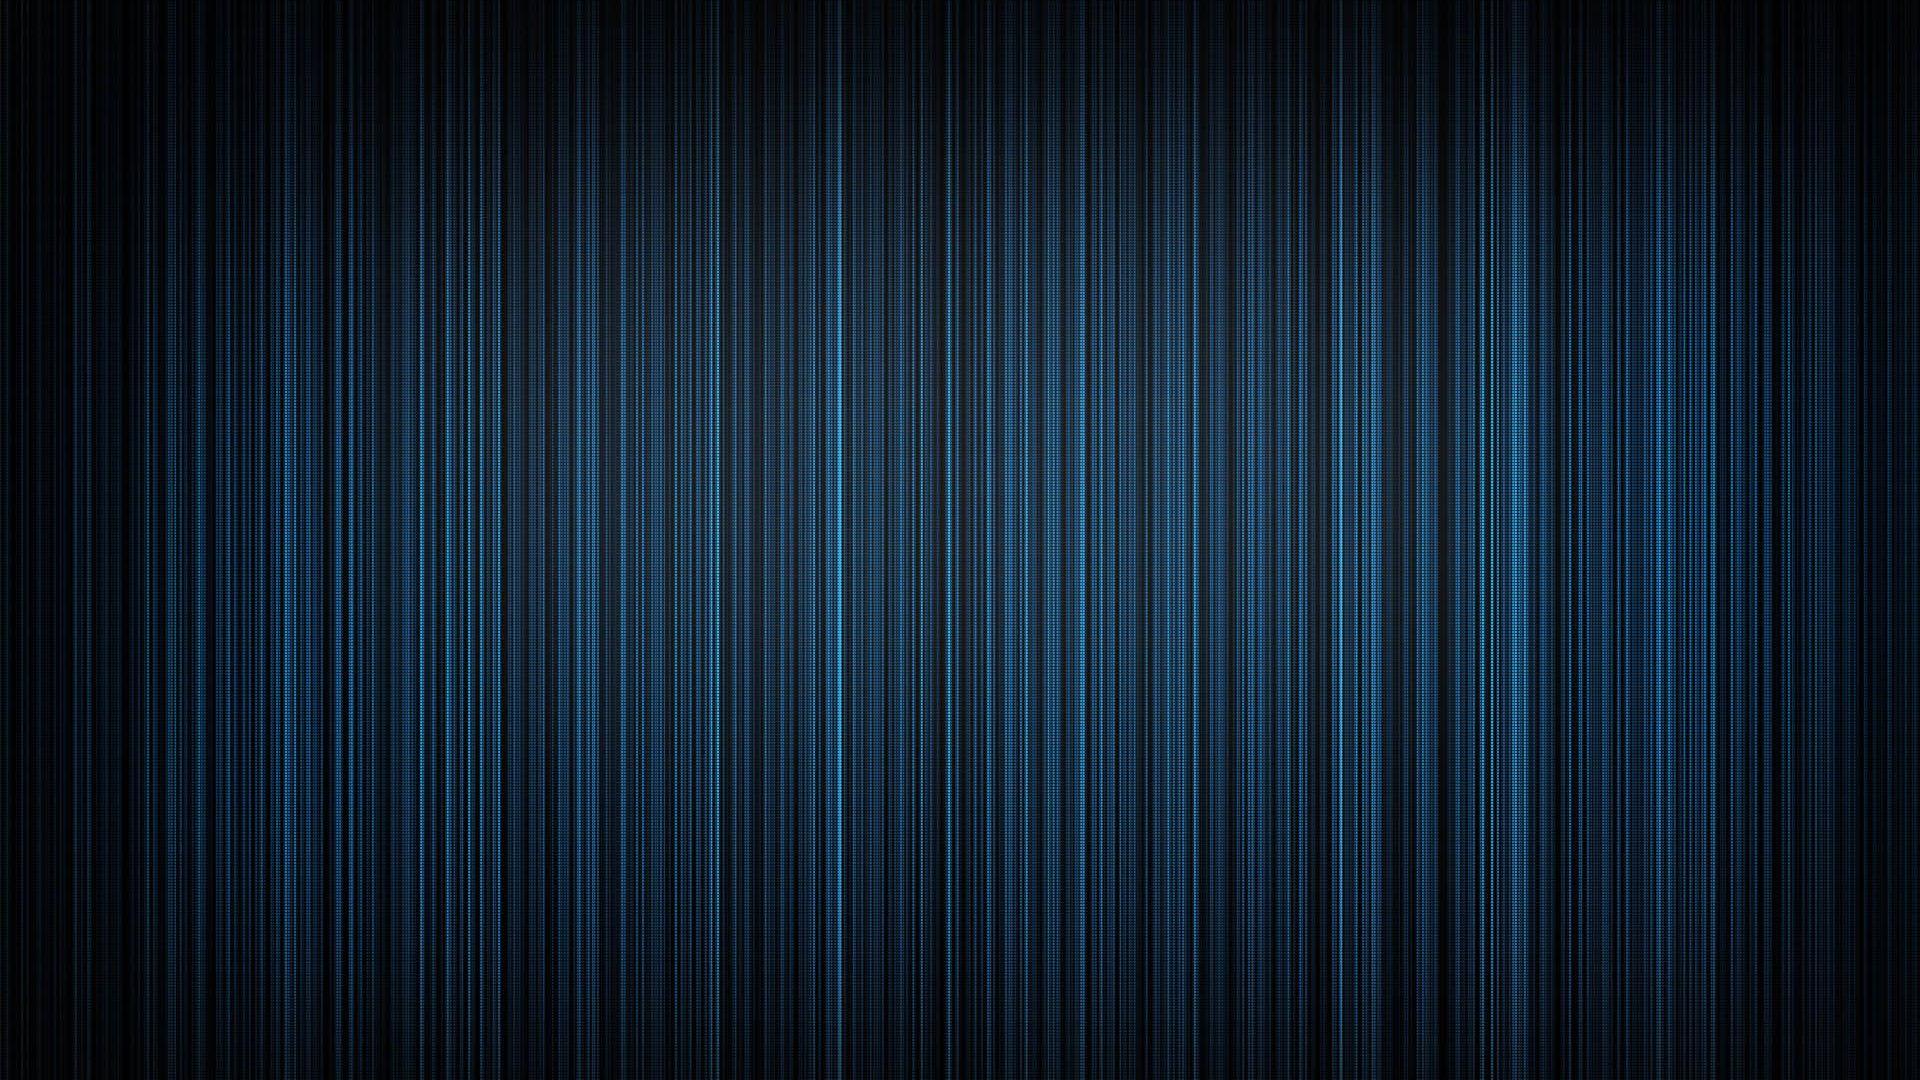 Free Download Best Cinema Screen Desktop Wallpapers Background Collection 1920x1200 For Your Desktop Mobile Tablet Explore 48 Make Wallpaper Fit Screen Fit Desktop Wallpaper To Screen Wallpaper To Fit Desktop